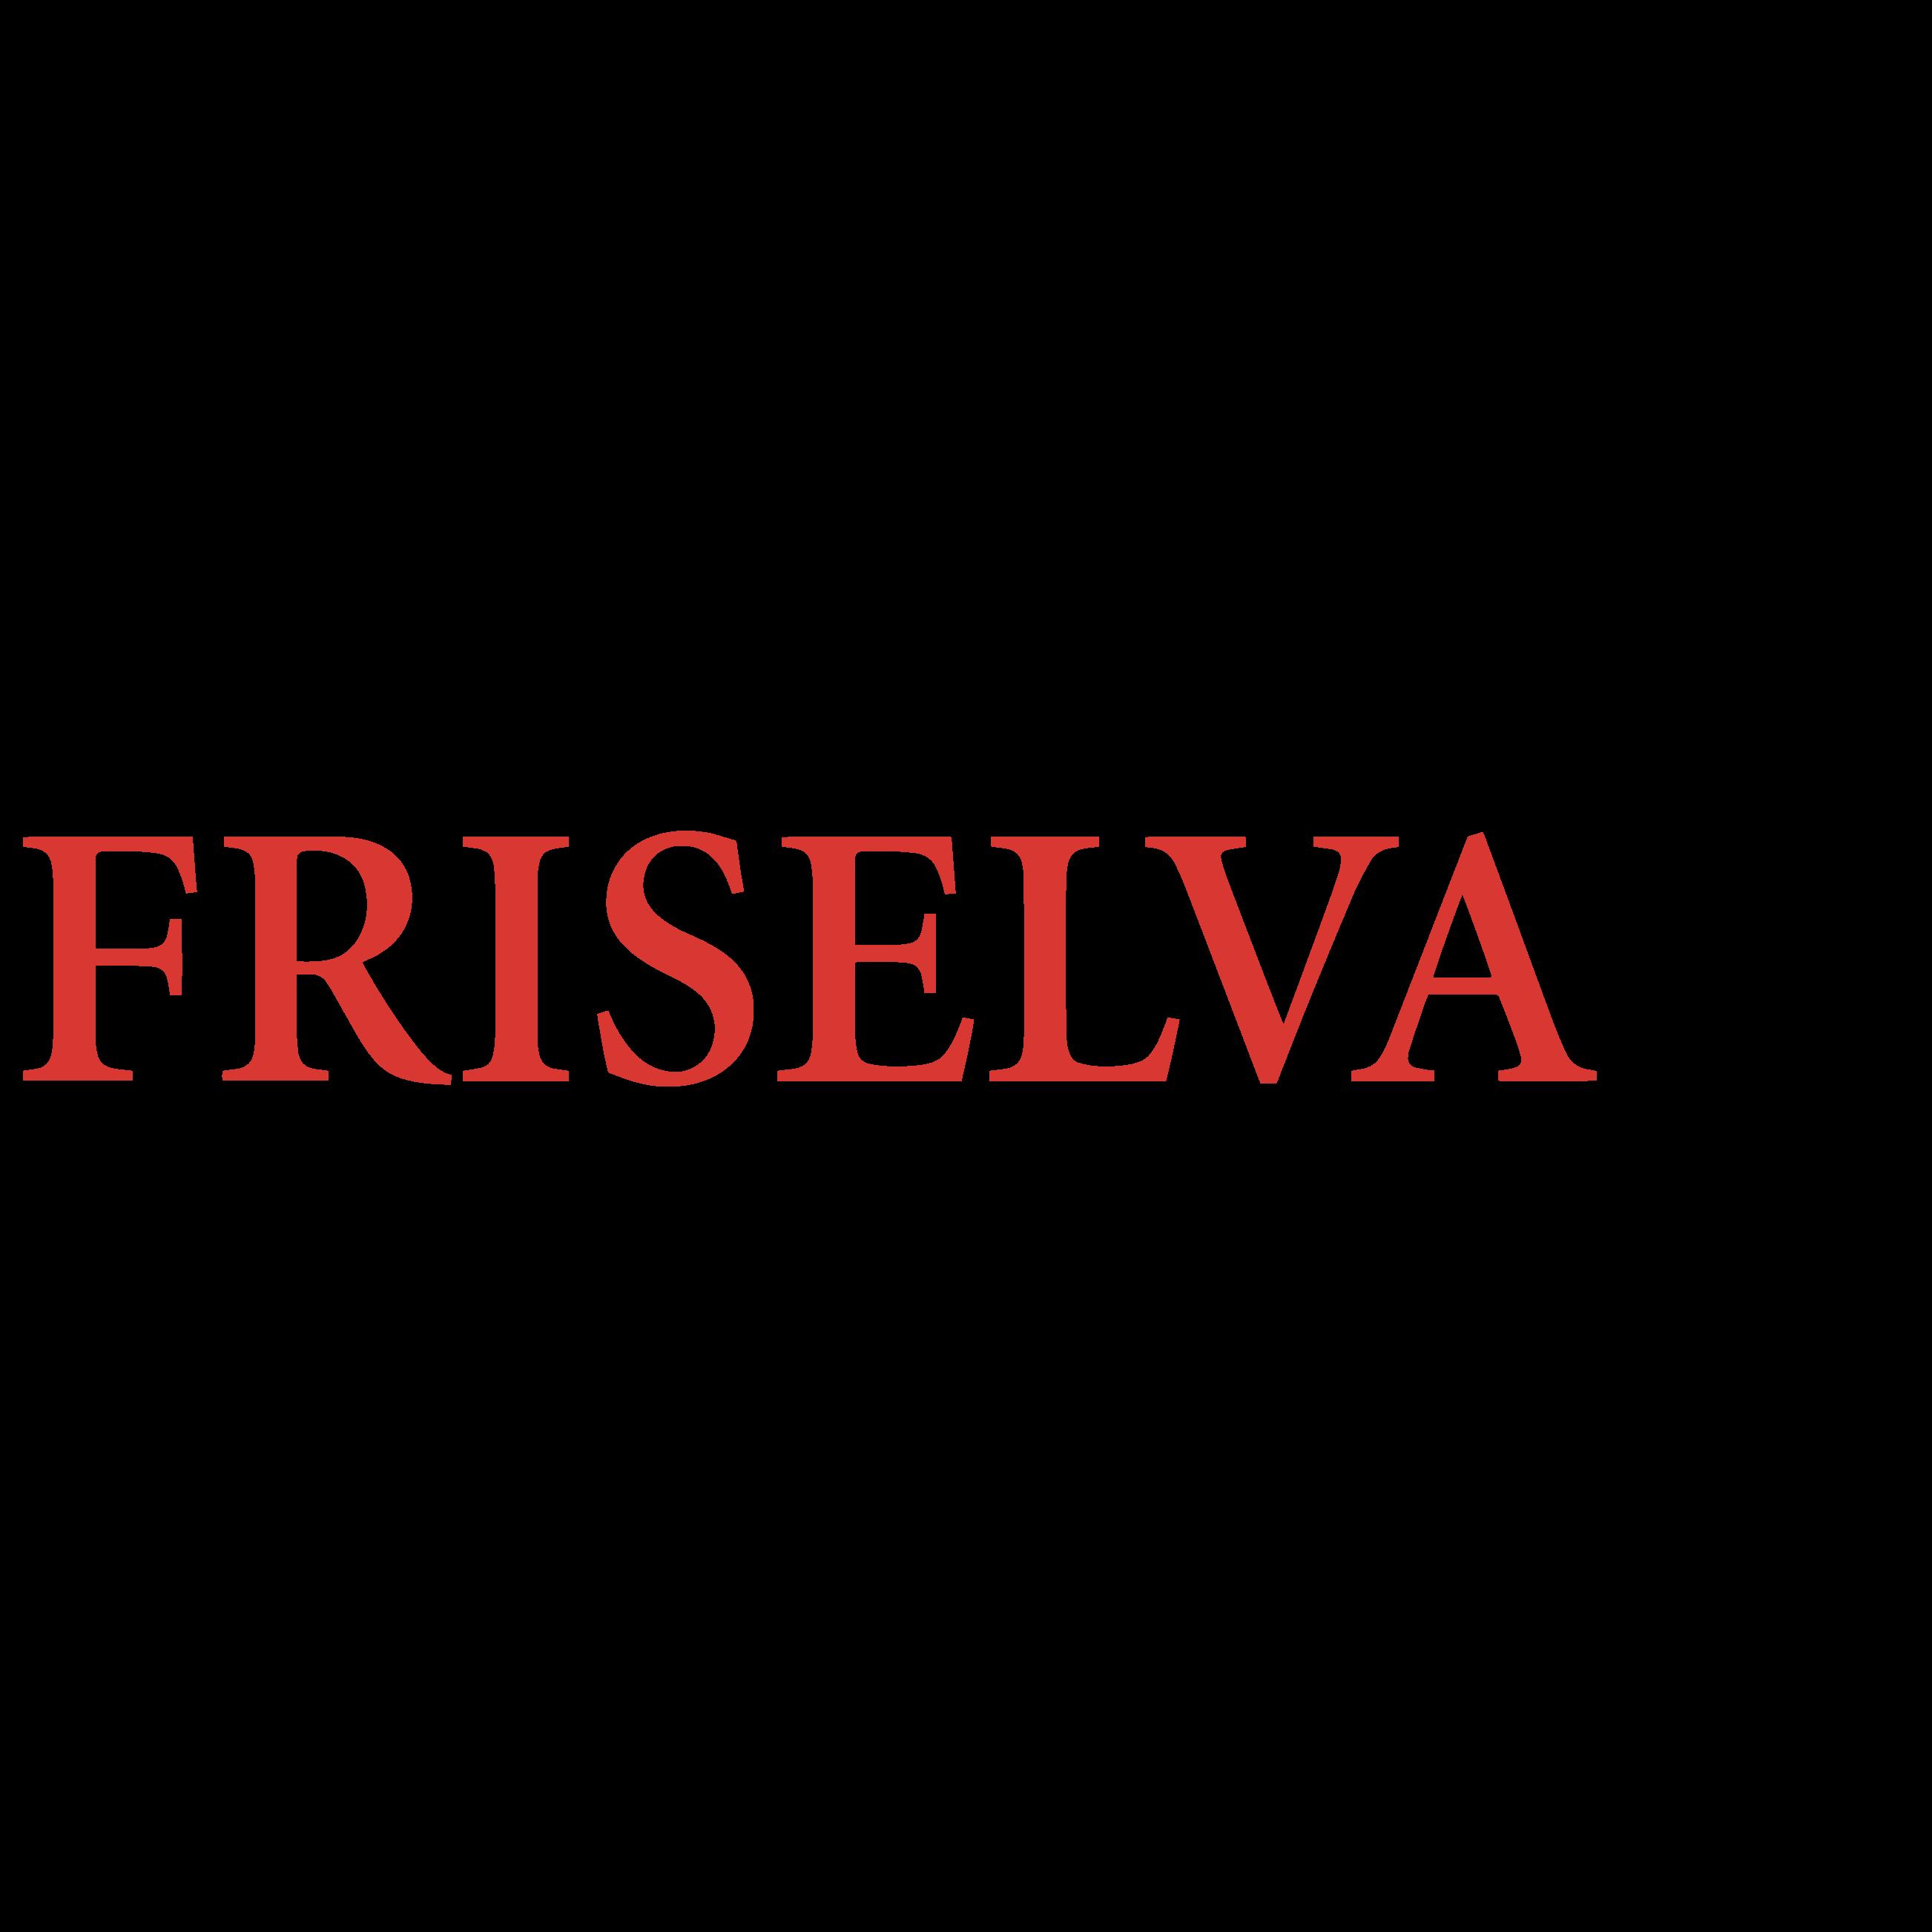 https://www.friselva.com/